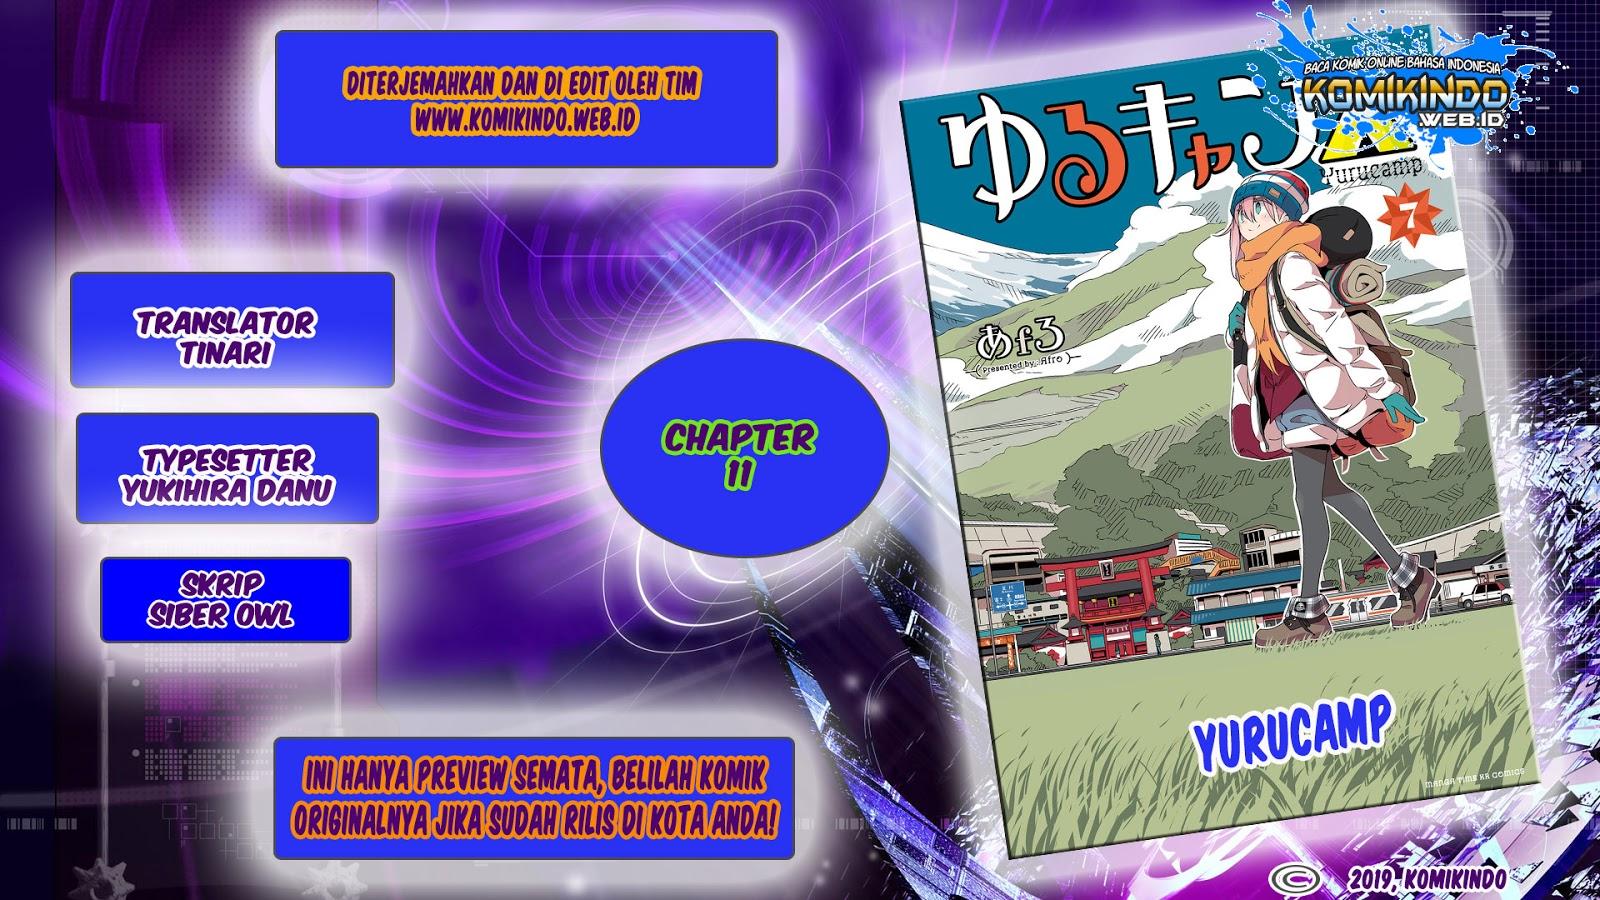 Dilarang COPAS - situs resmi www.mangacanblog.com - Komik yuru camp 011 - chapter 11 12 Indonesia yuru camp 011 - chapter 11 Terbaru 1|Baca Manga Komik Indonesia|Mangacan